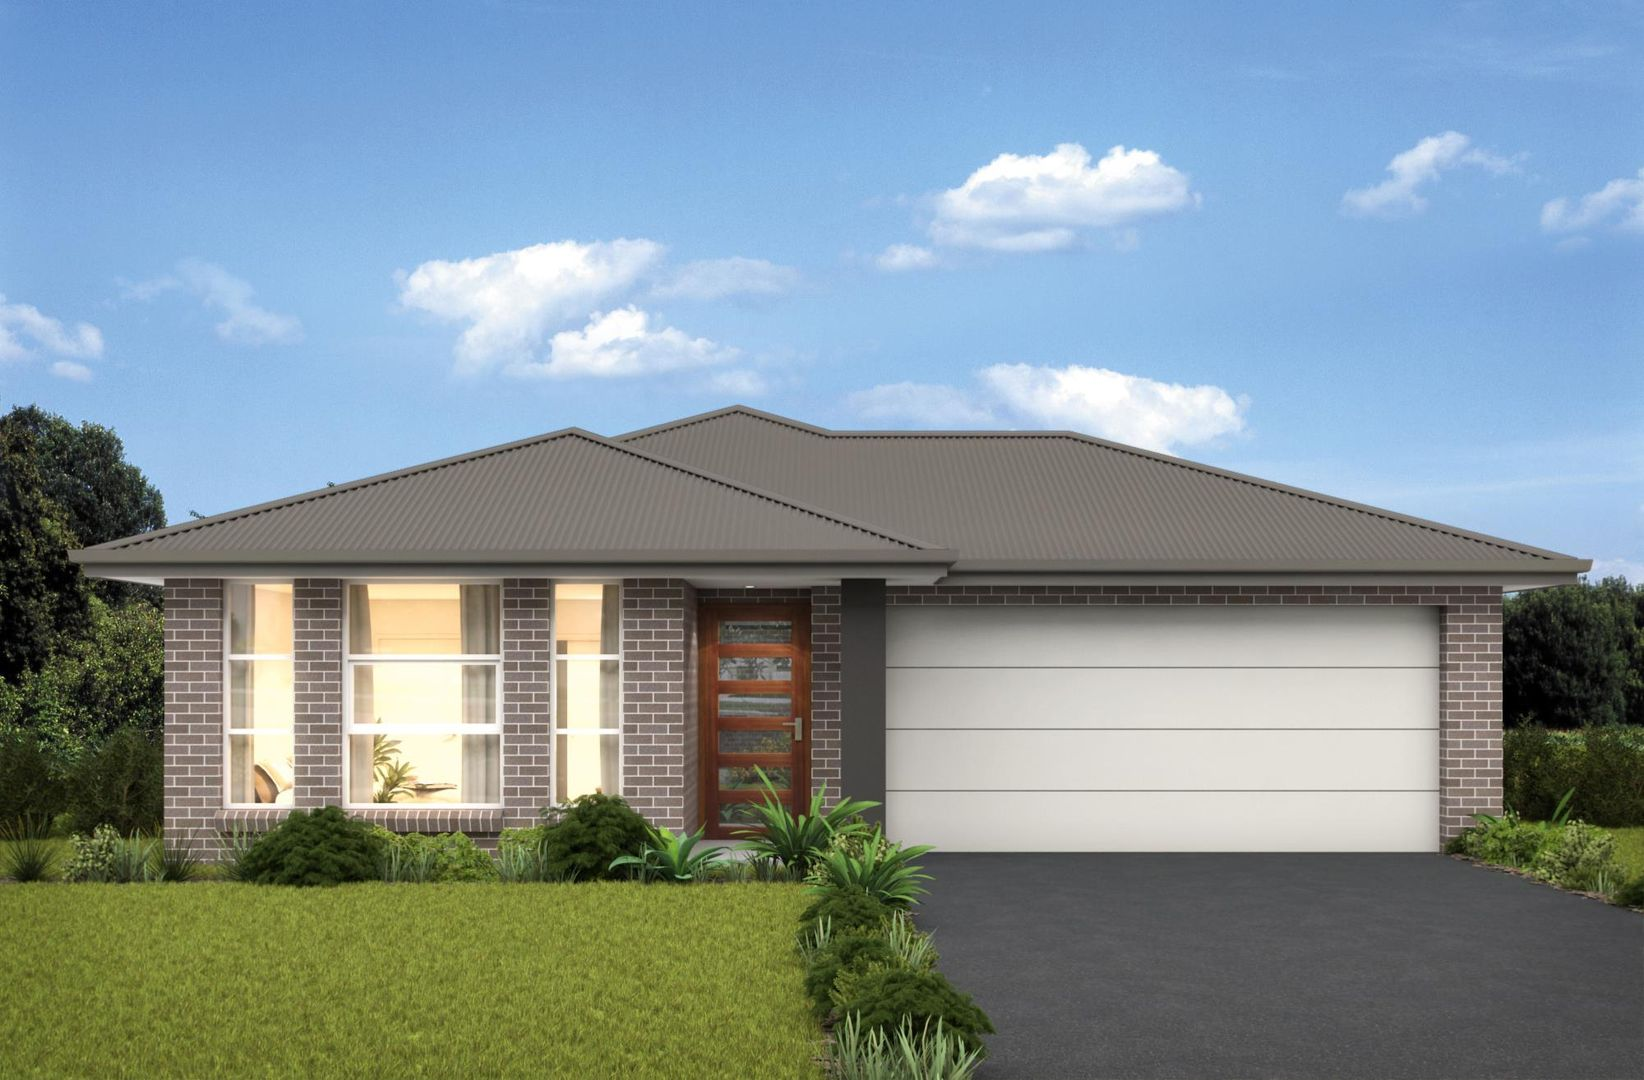 Lot 139 Neeson Road, Kembla Grange NSW 2526, Image 0